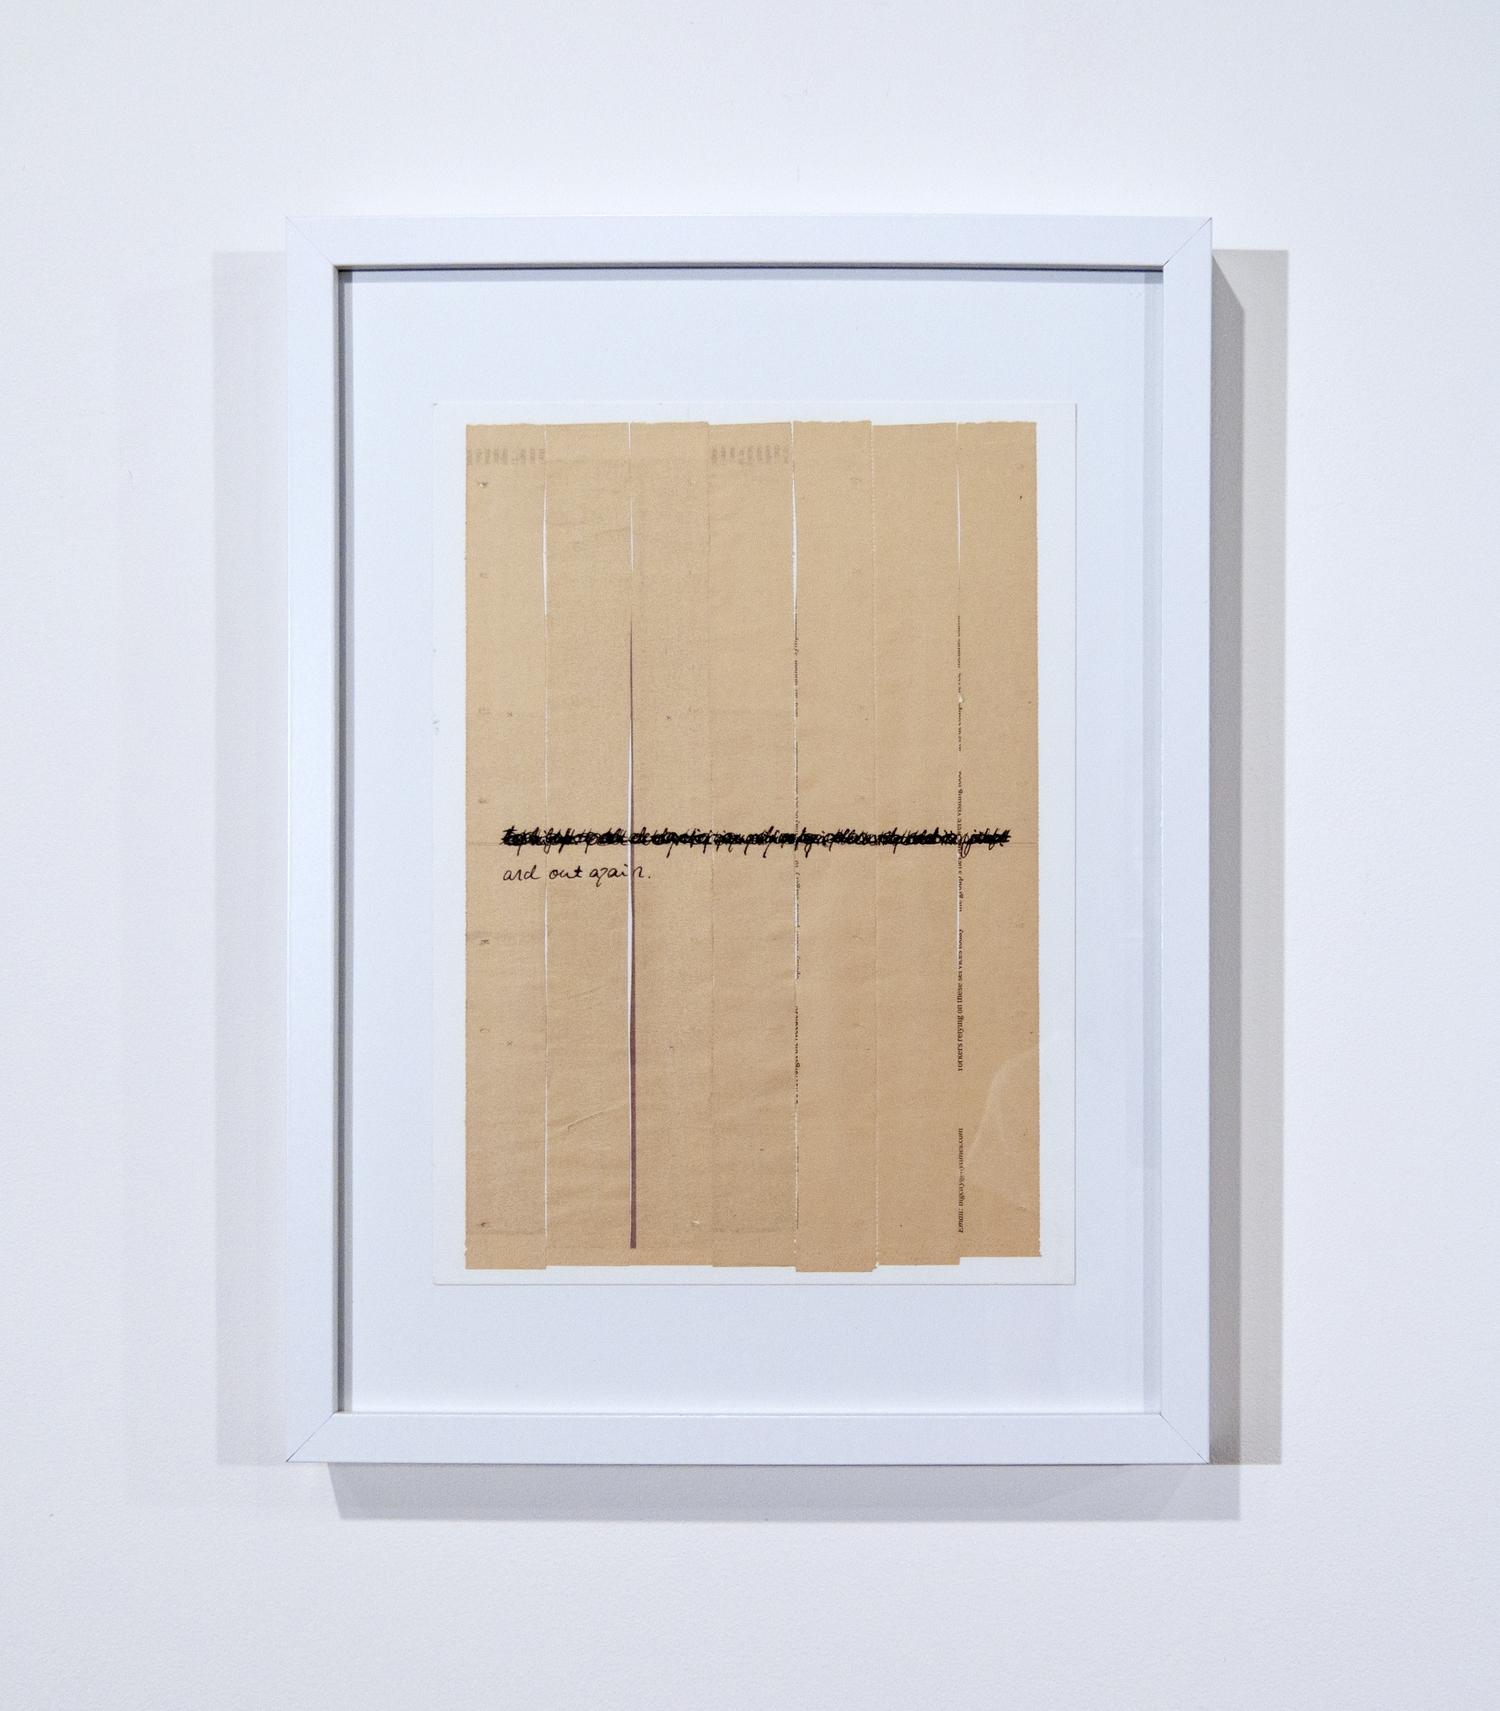 Recitation (Big and a sequence), 2014